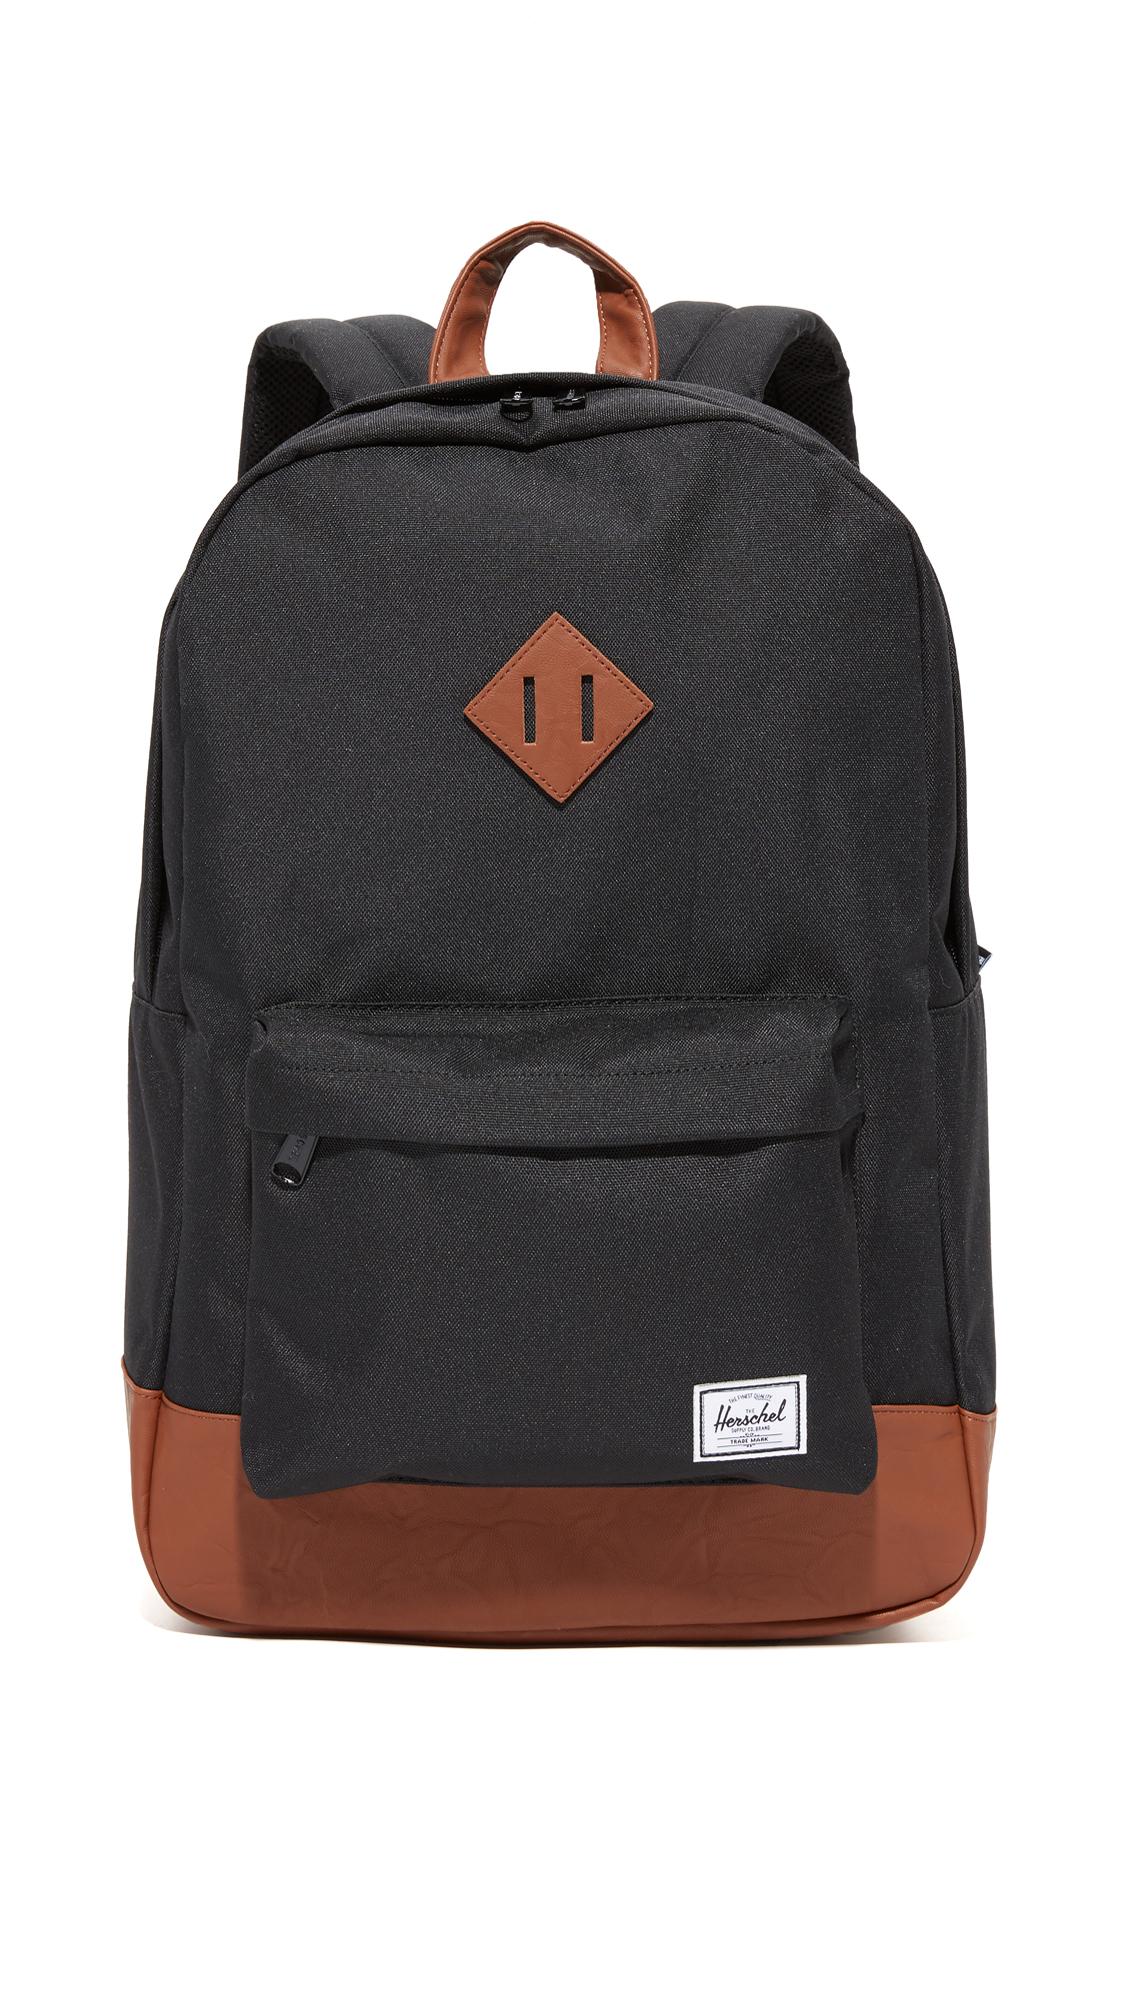 63443b27695b Herschel Supply Co. Heritage Classic Backpack